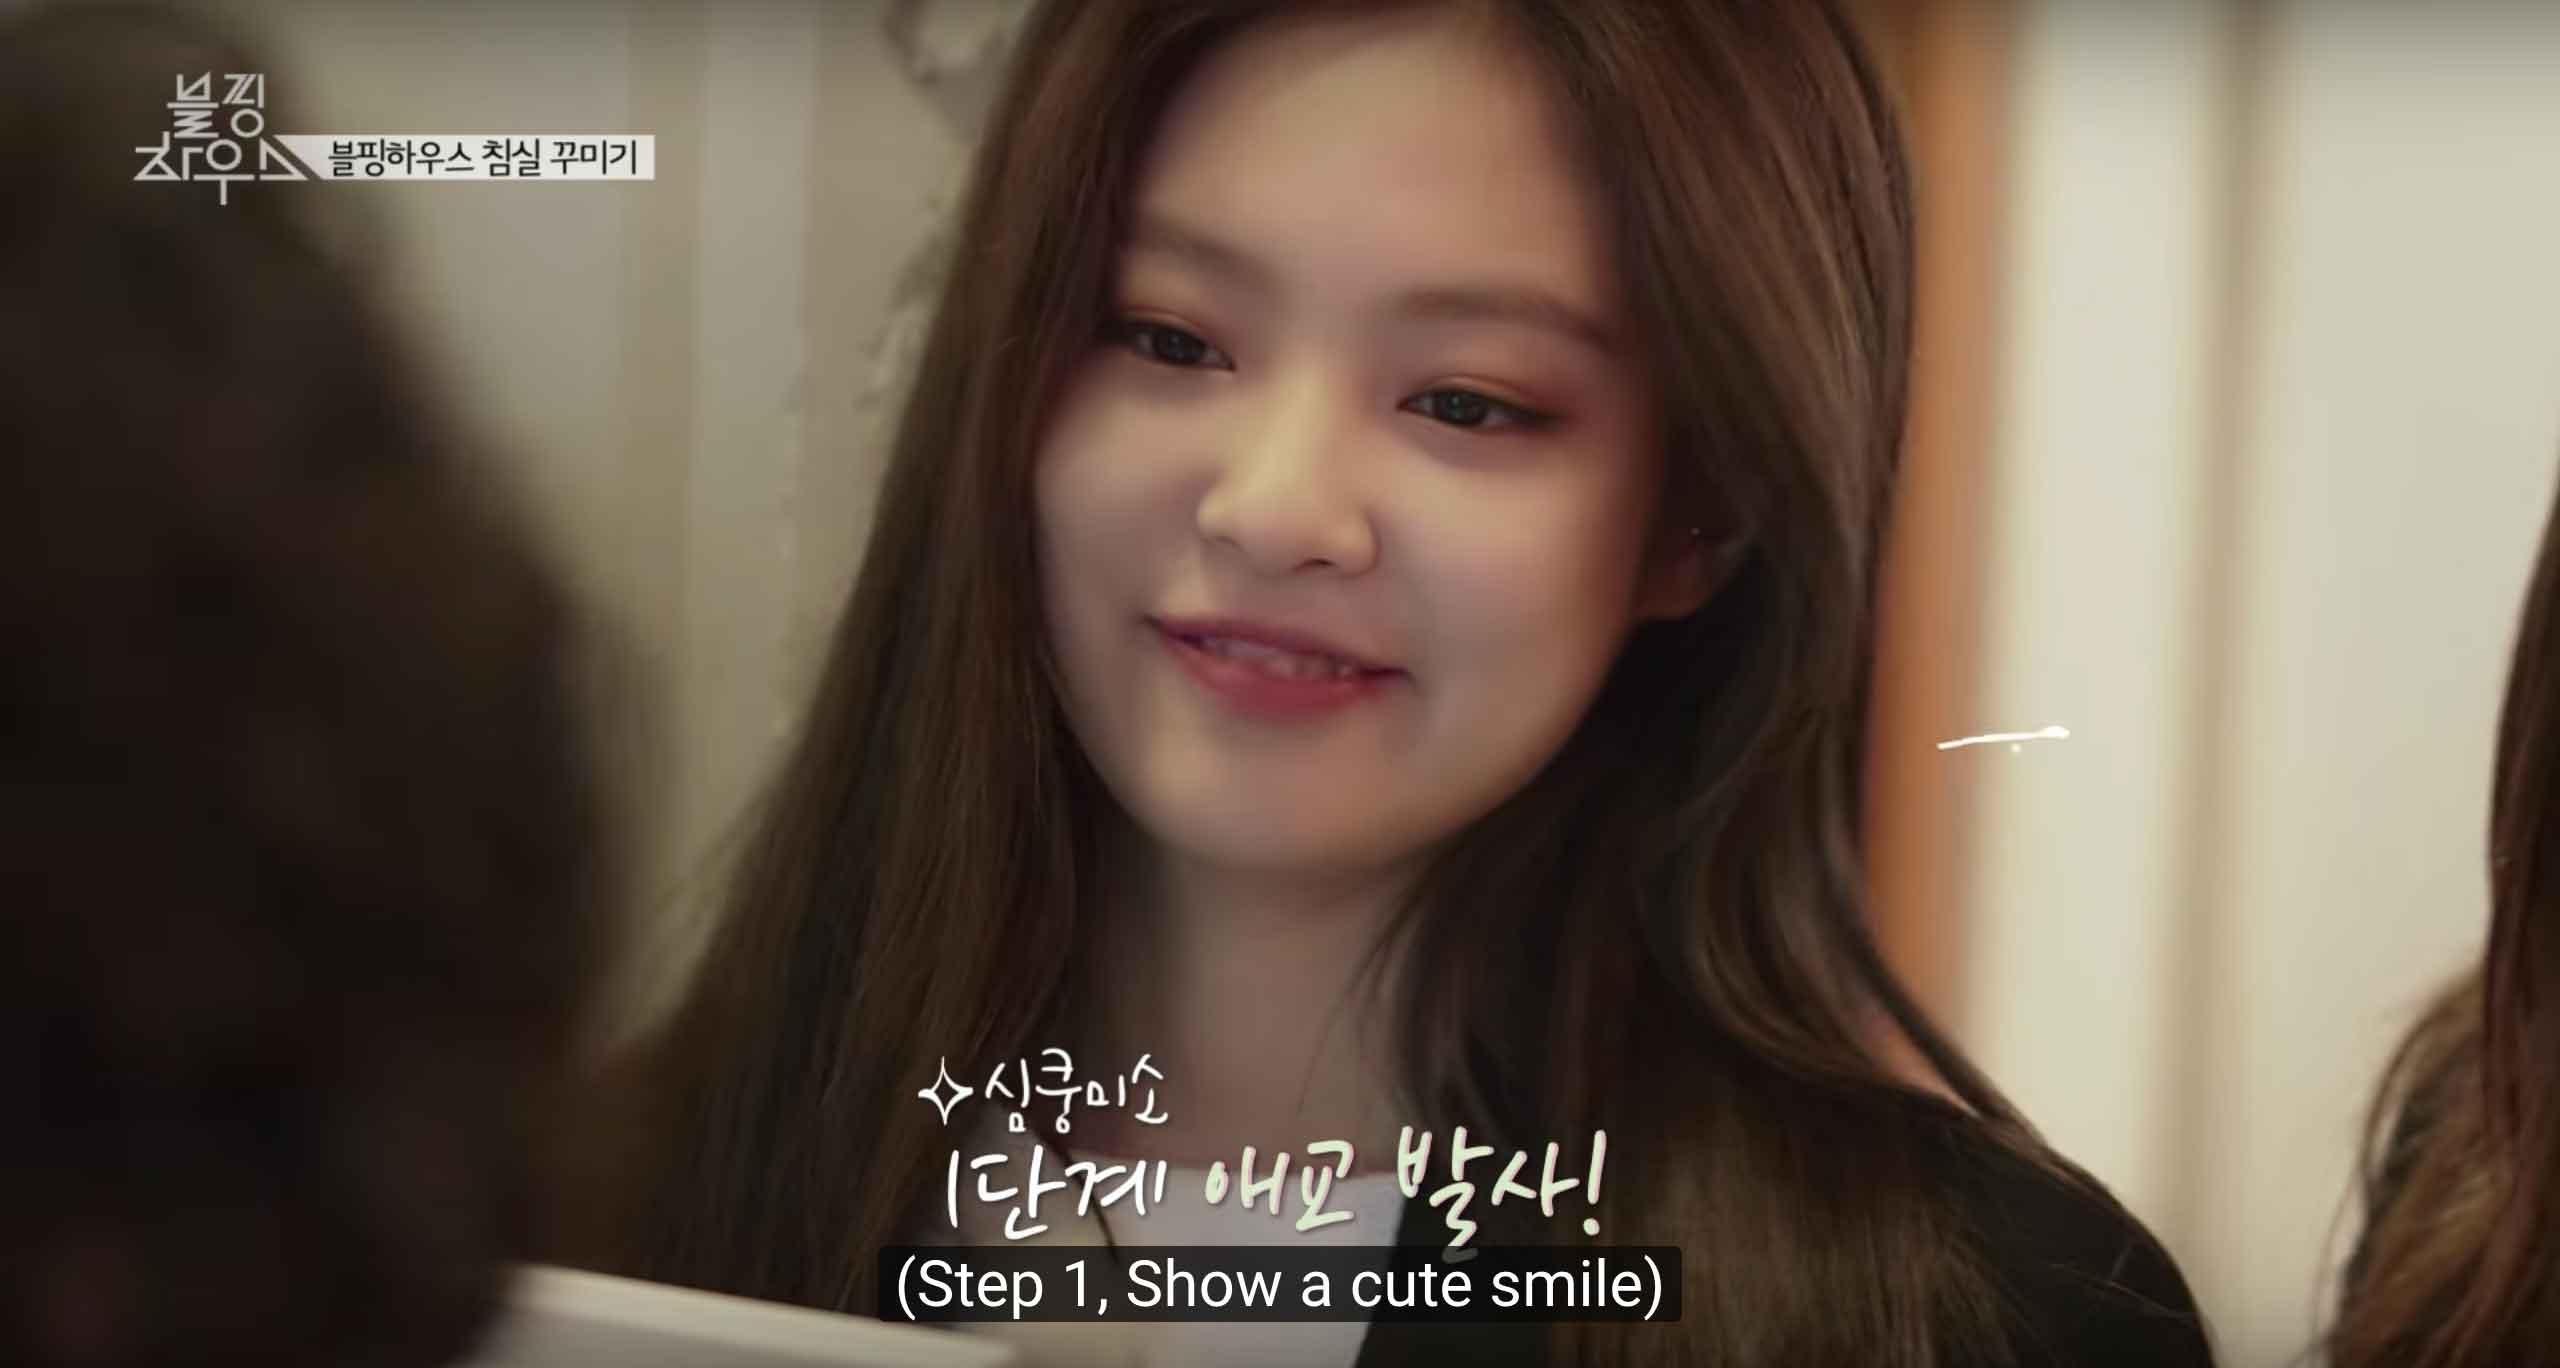 Jennie-aegyo-to-get-discount